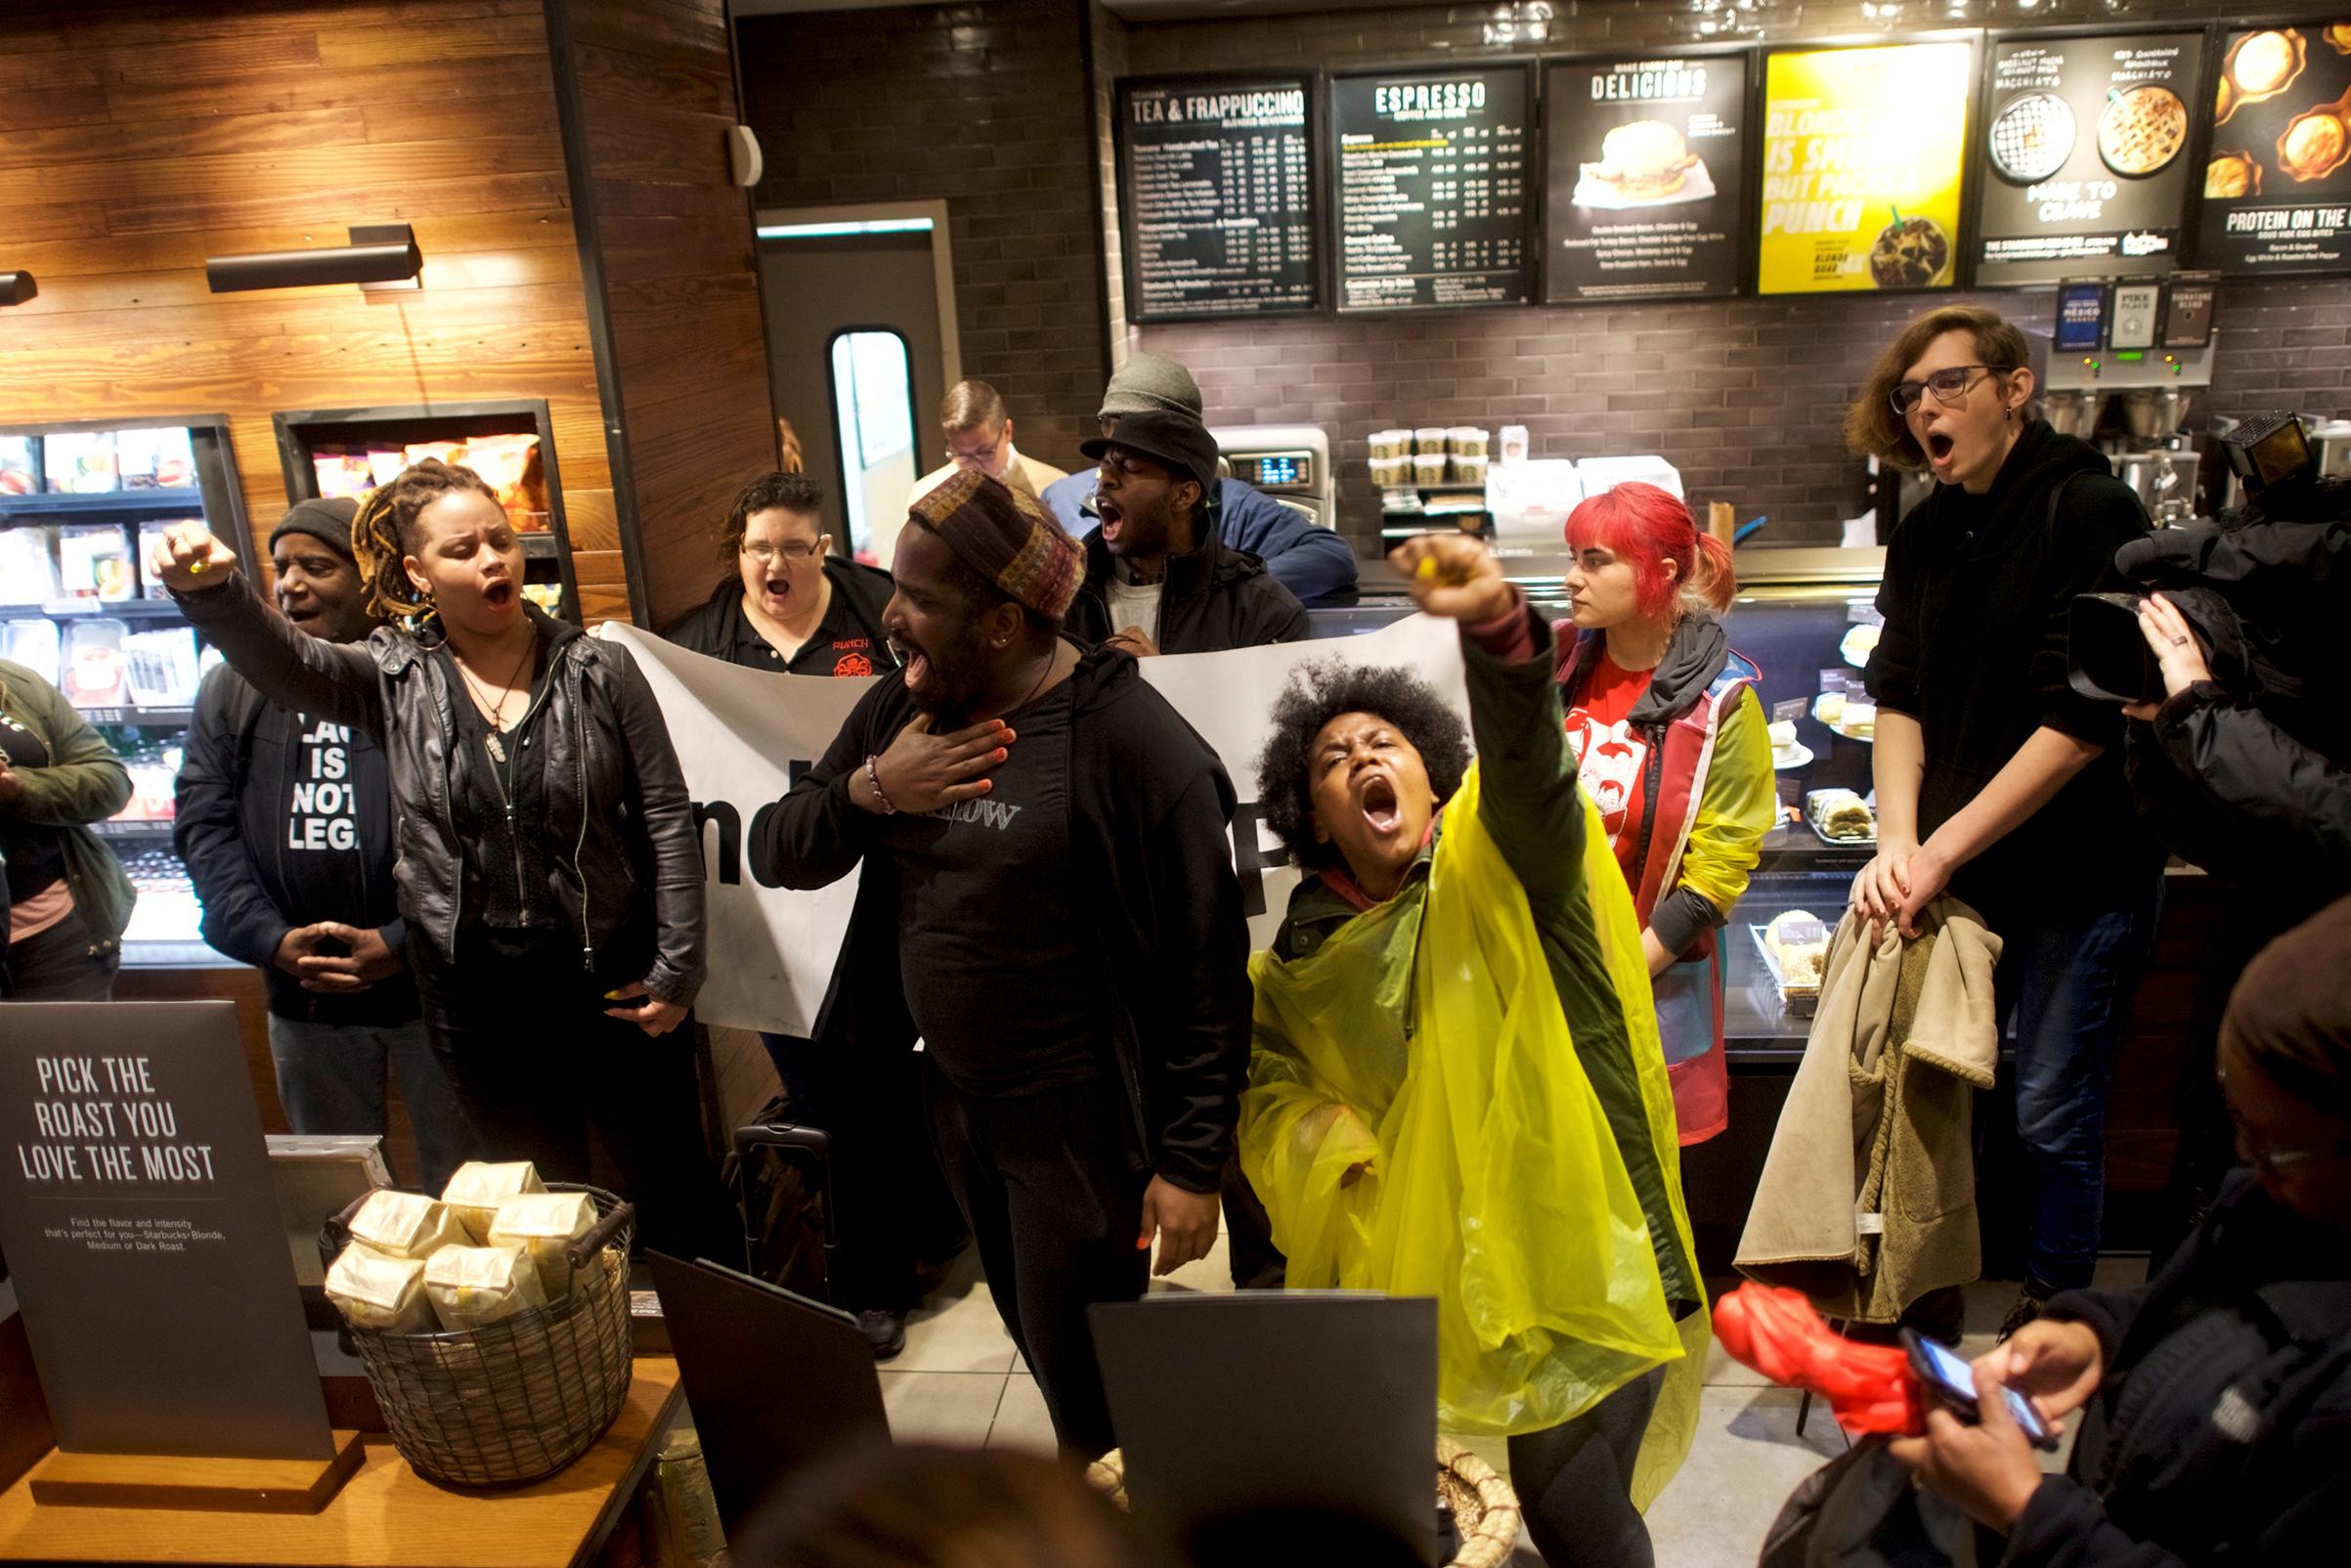 Protesters demonstrate inside a Center City Starbucks, where two black men were arrested, in Philadelphia, Pennsylvania, U.S., April 16, 2018